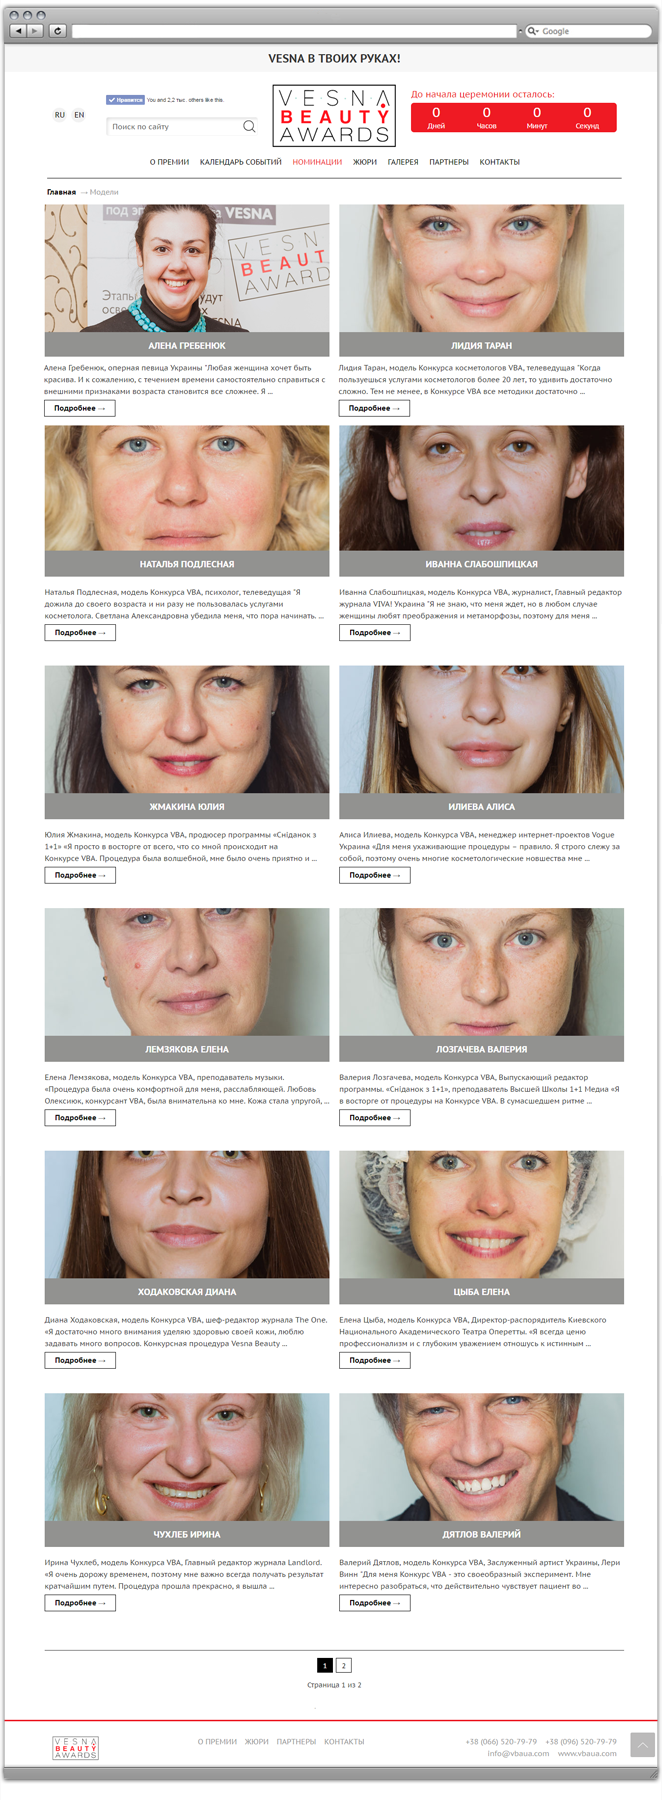 Модели церемонии Vesna Beuty Awars